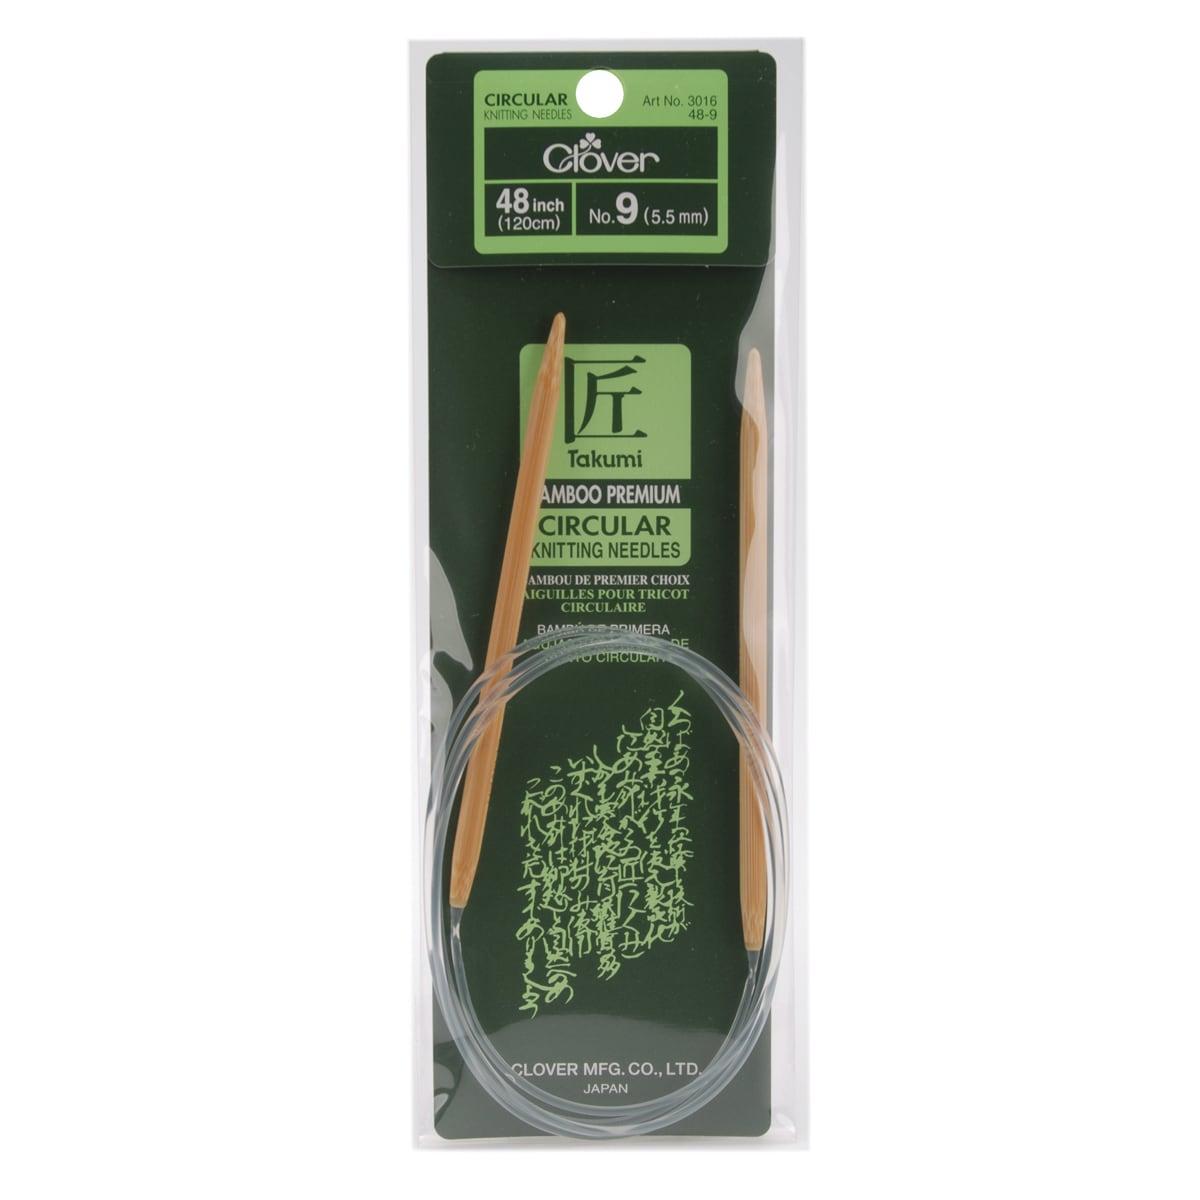 "Bamboo Circular Knitting Needles 48""-Size 9"